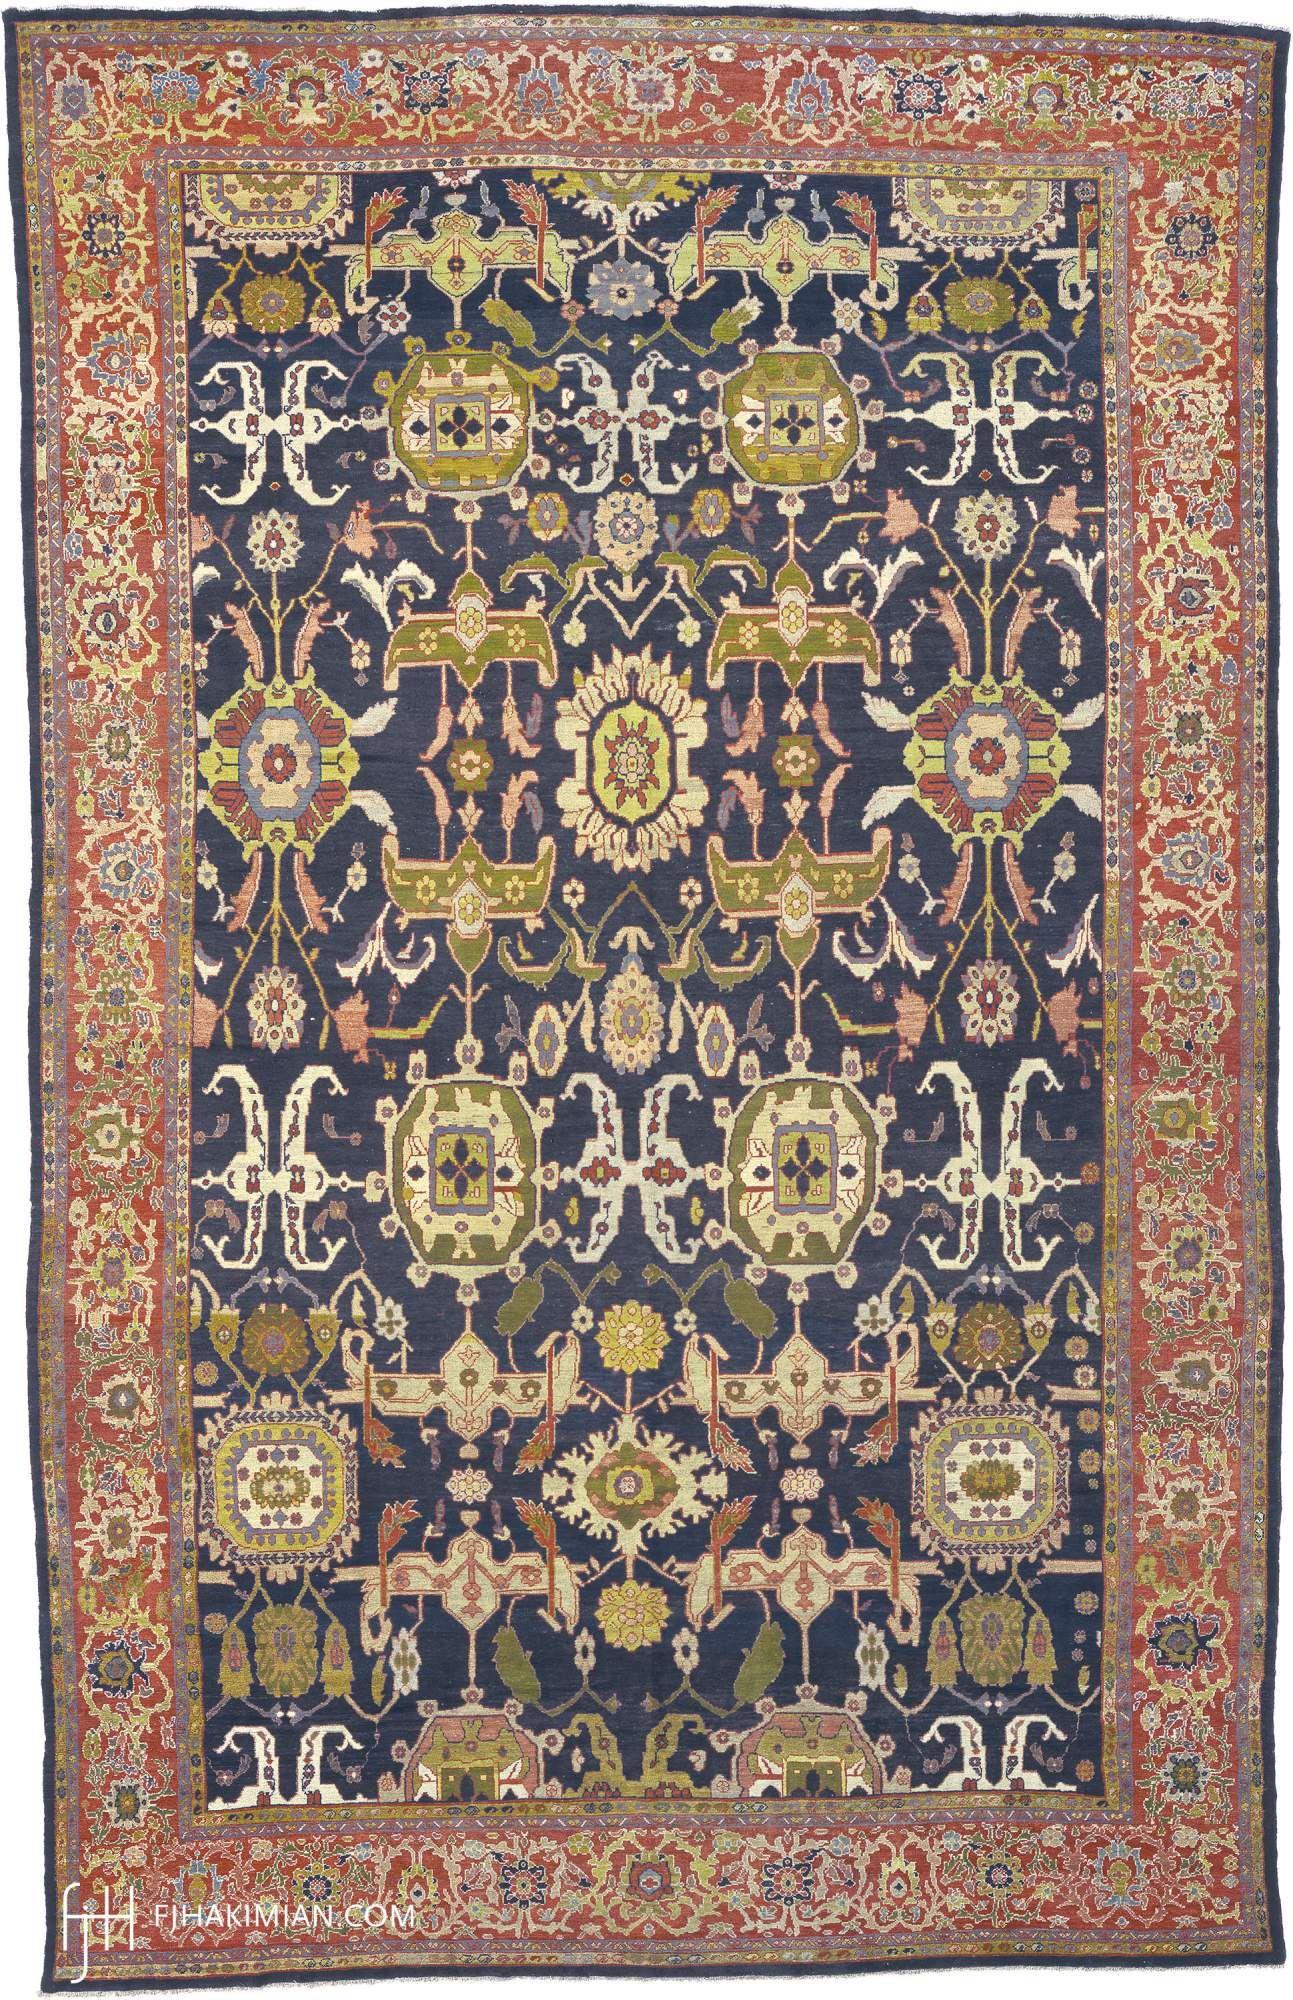 Oversize Rugs Fj Hakimian Antique Oversizedrugs Rugs Carpet